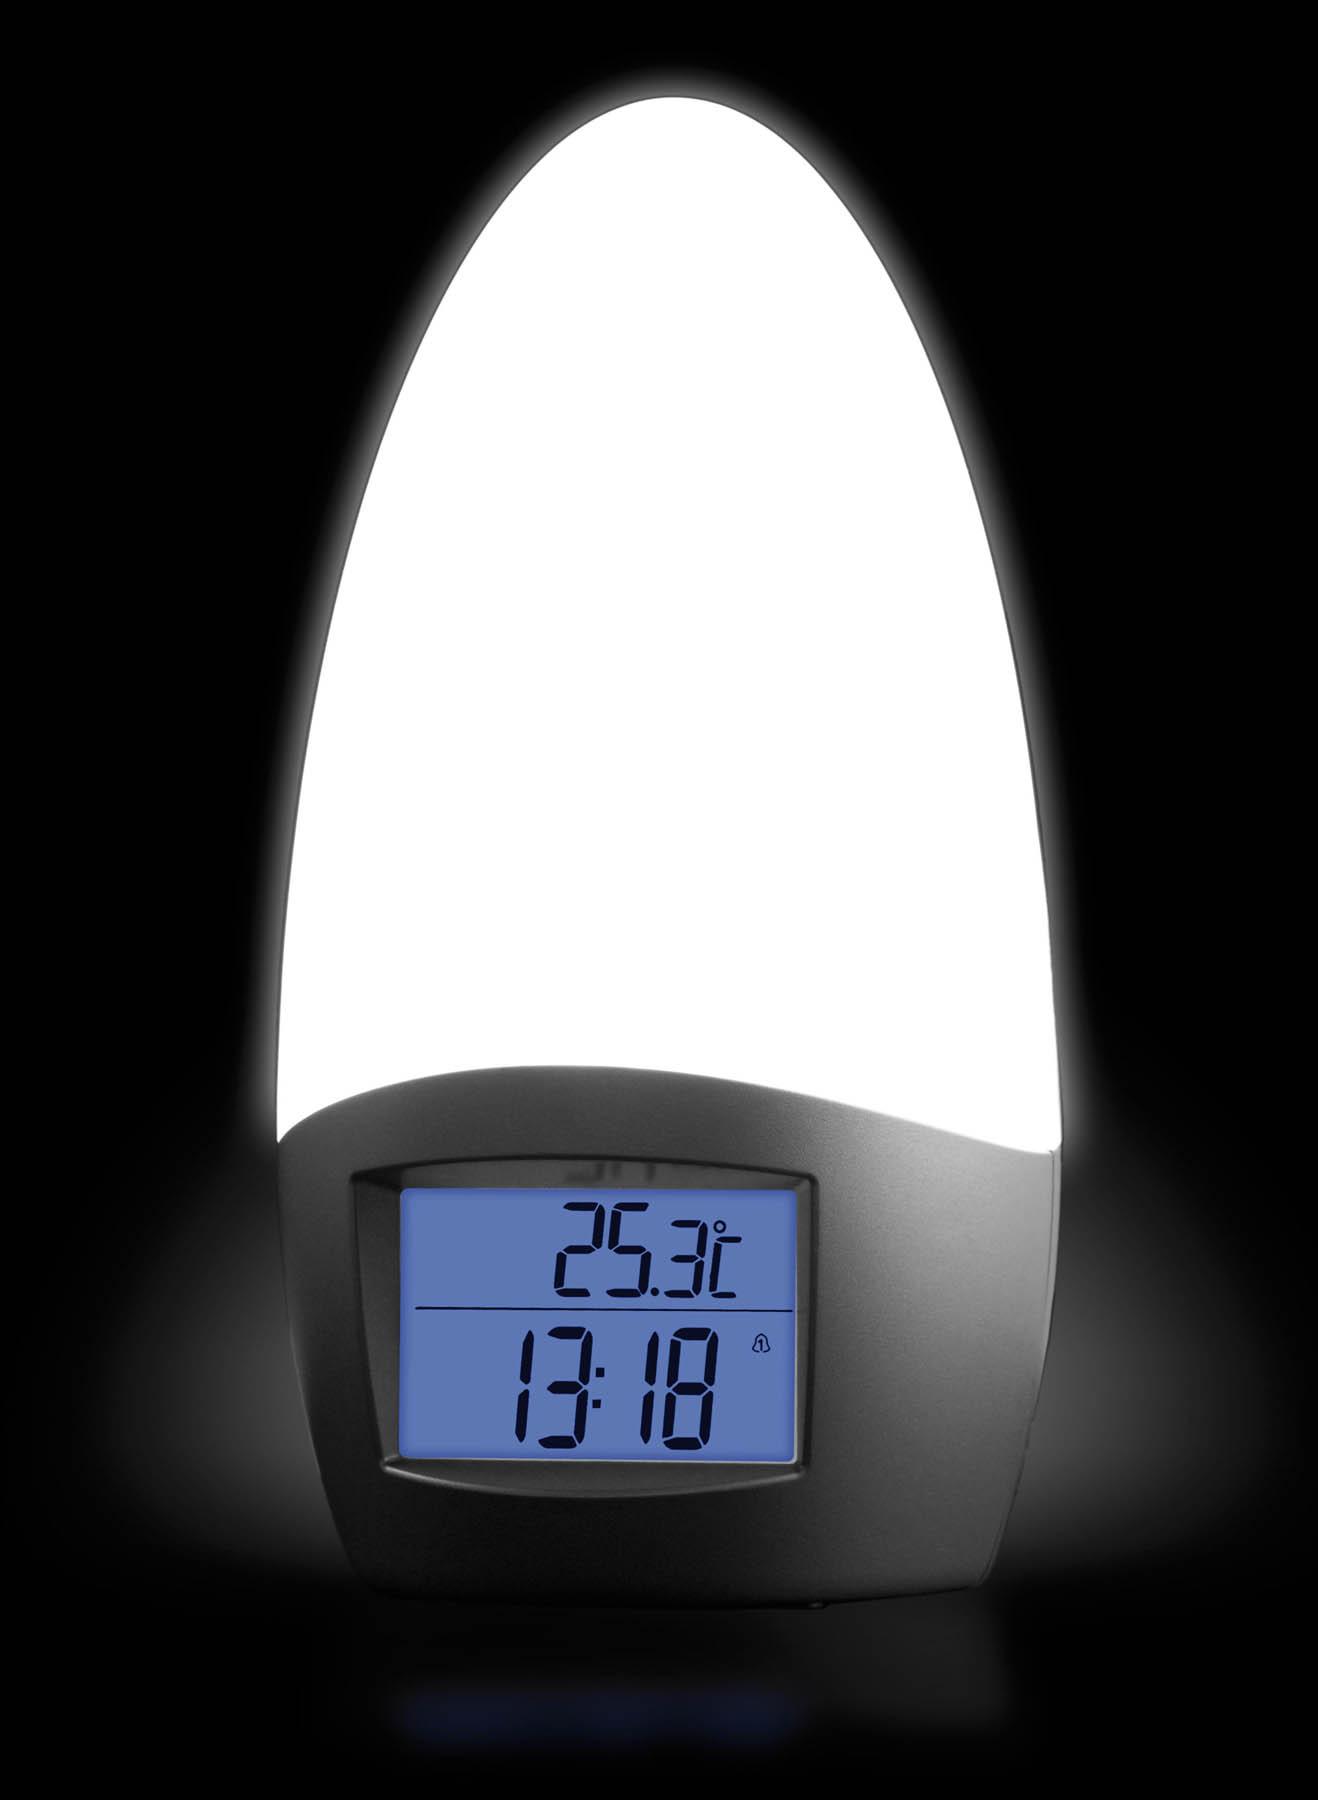 Radio Reveil Lumiere Finest Lampe De Rveil Lampe De